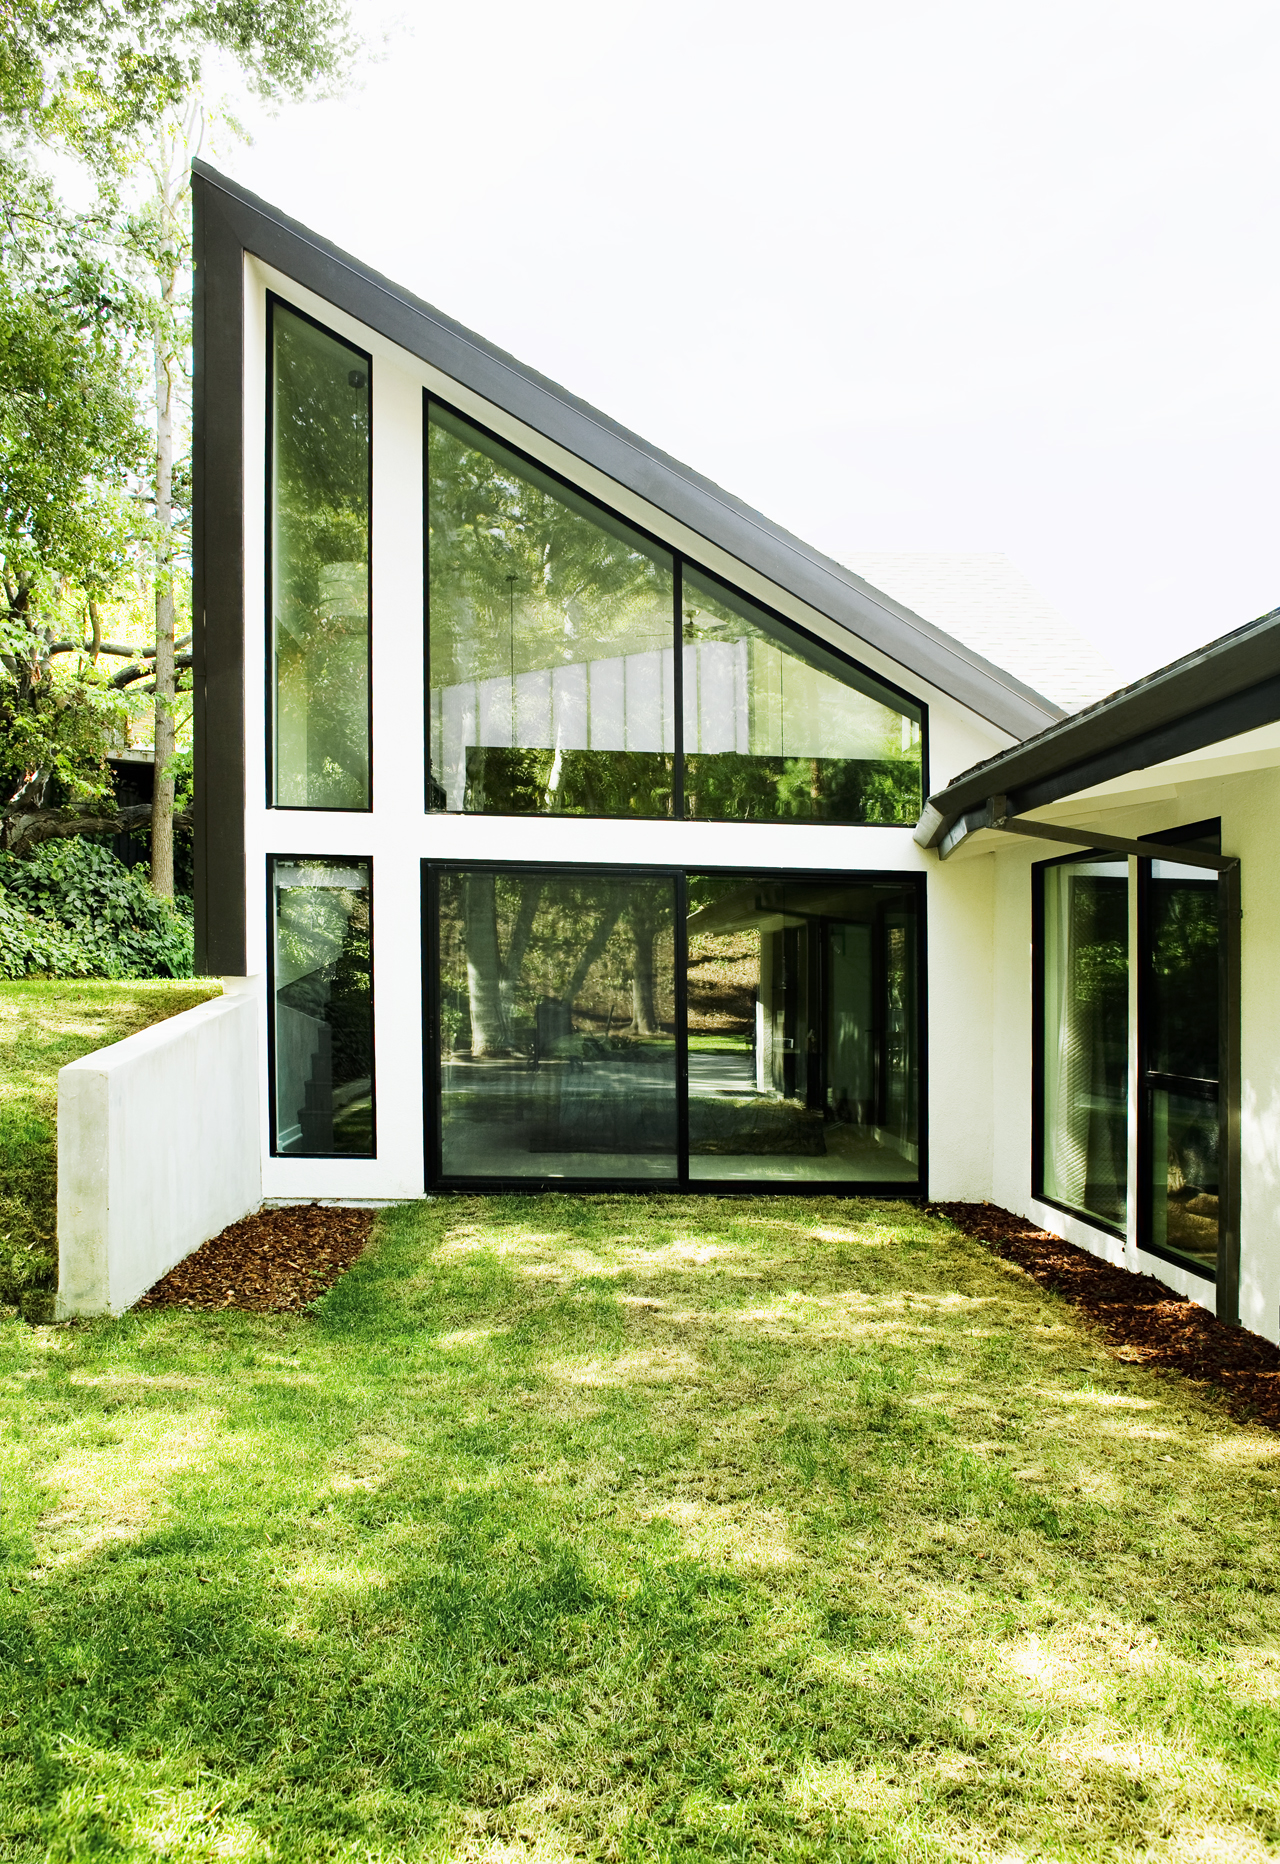 Sherman Oaks Residence / Warren Techentin Architecture, © Nicholas Alan Cope